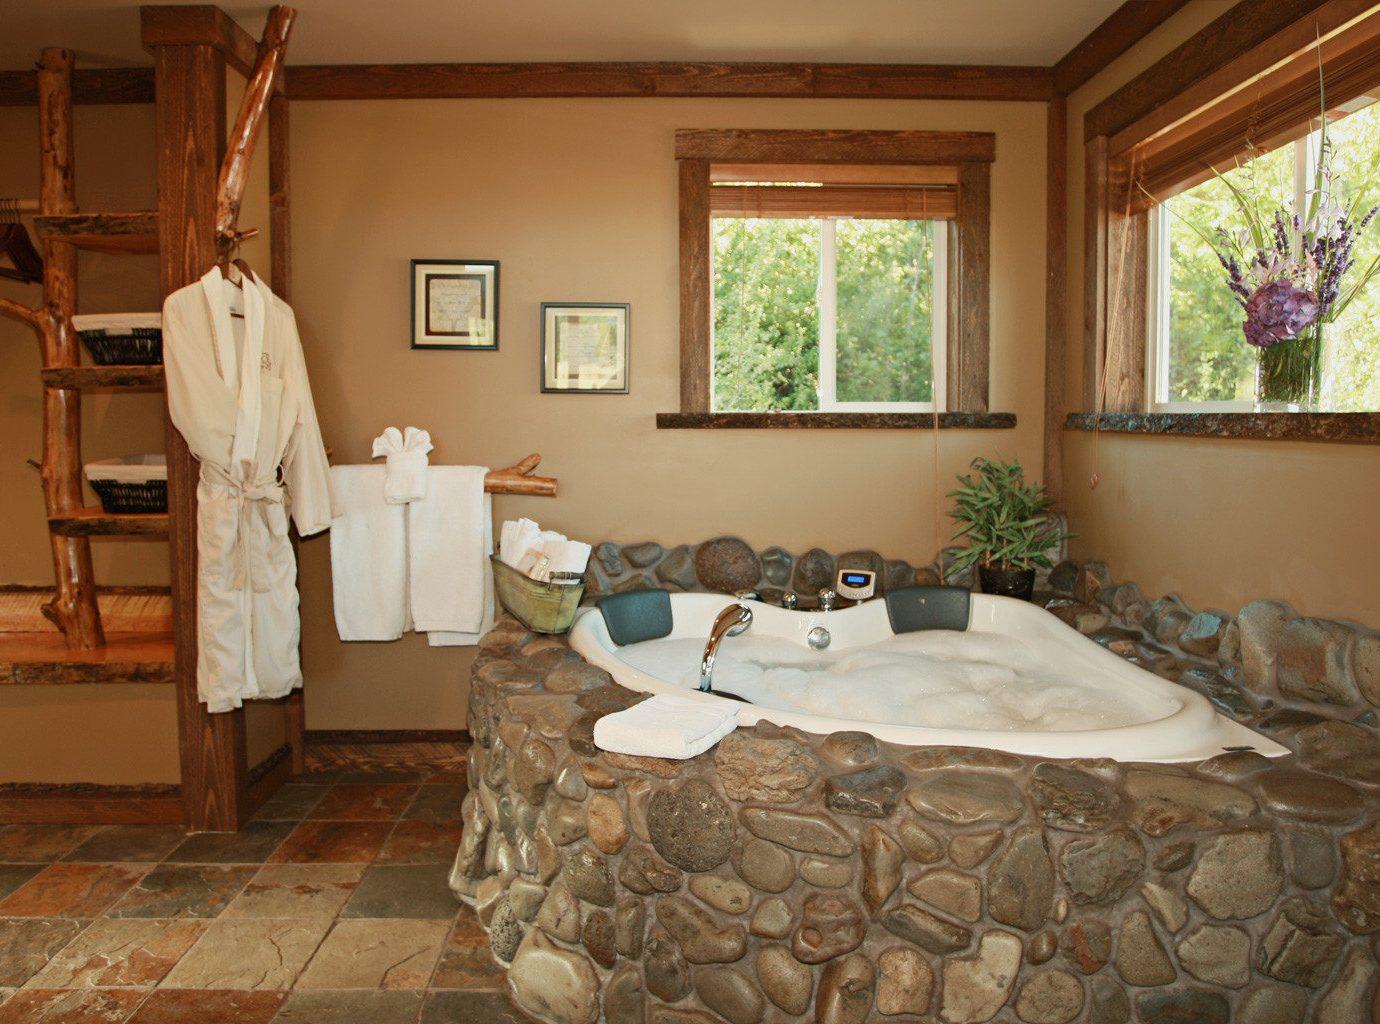 Bath Cabin Hot tub property home cottage living room farmhouse